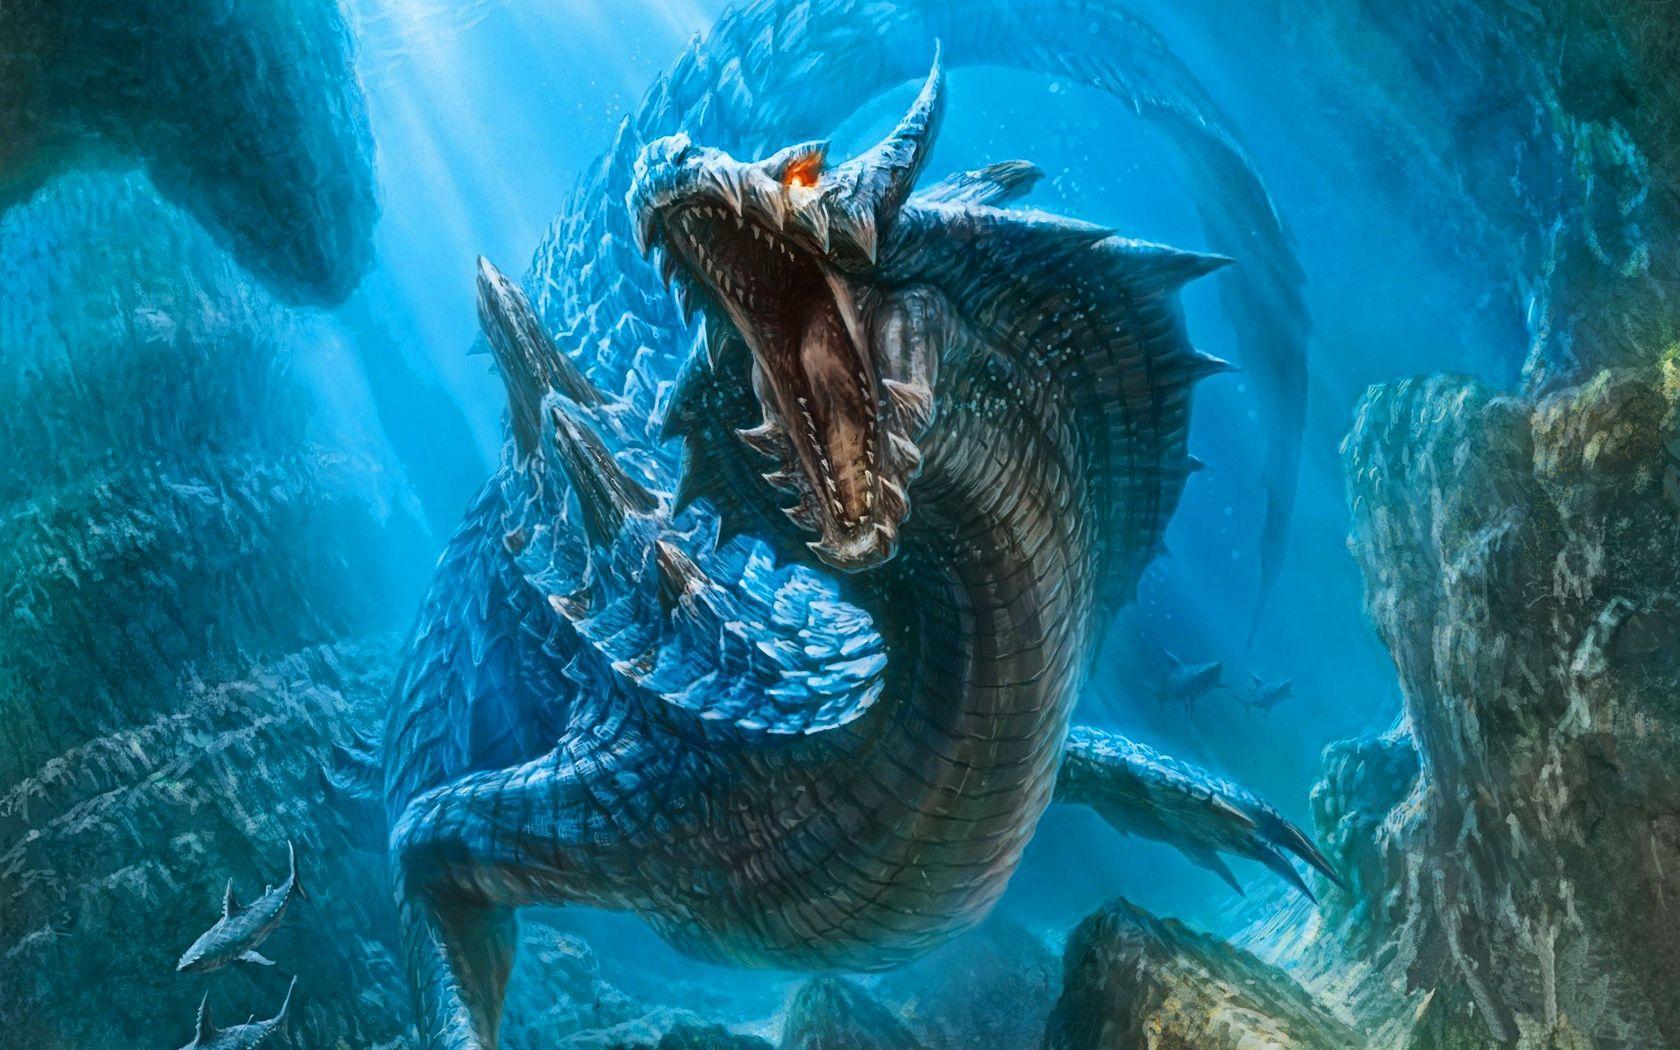 Water Dragon Wallpapers Hd Wallpaper Cave